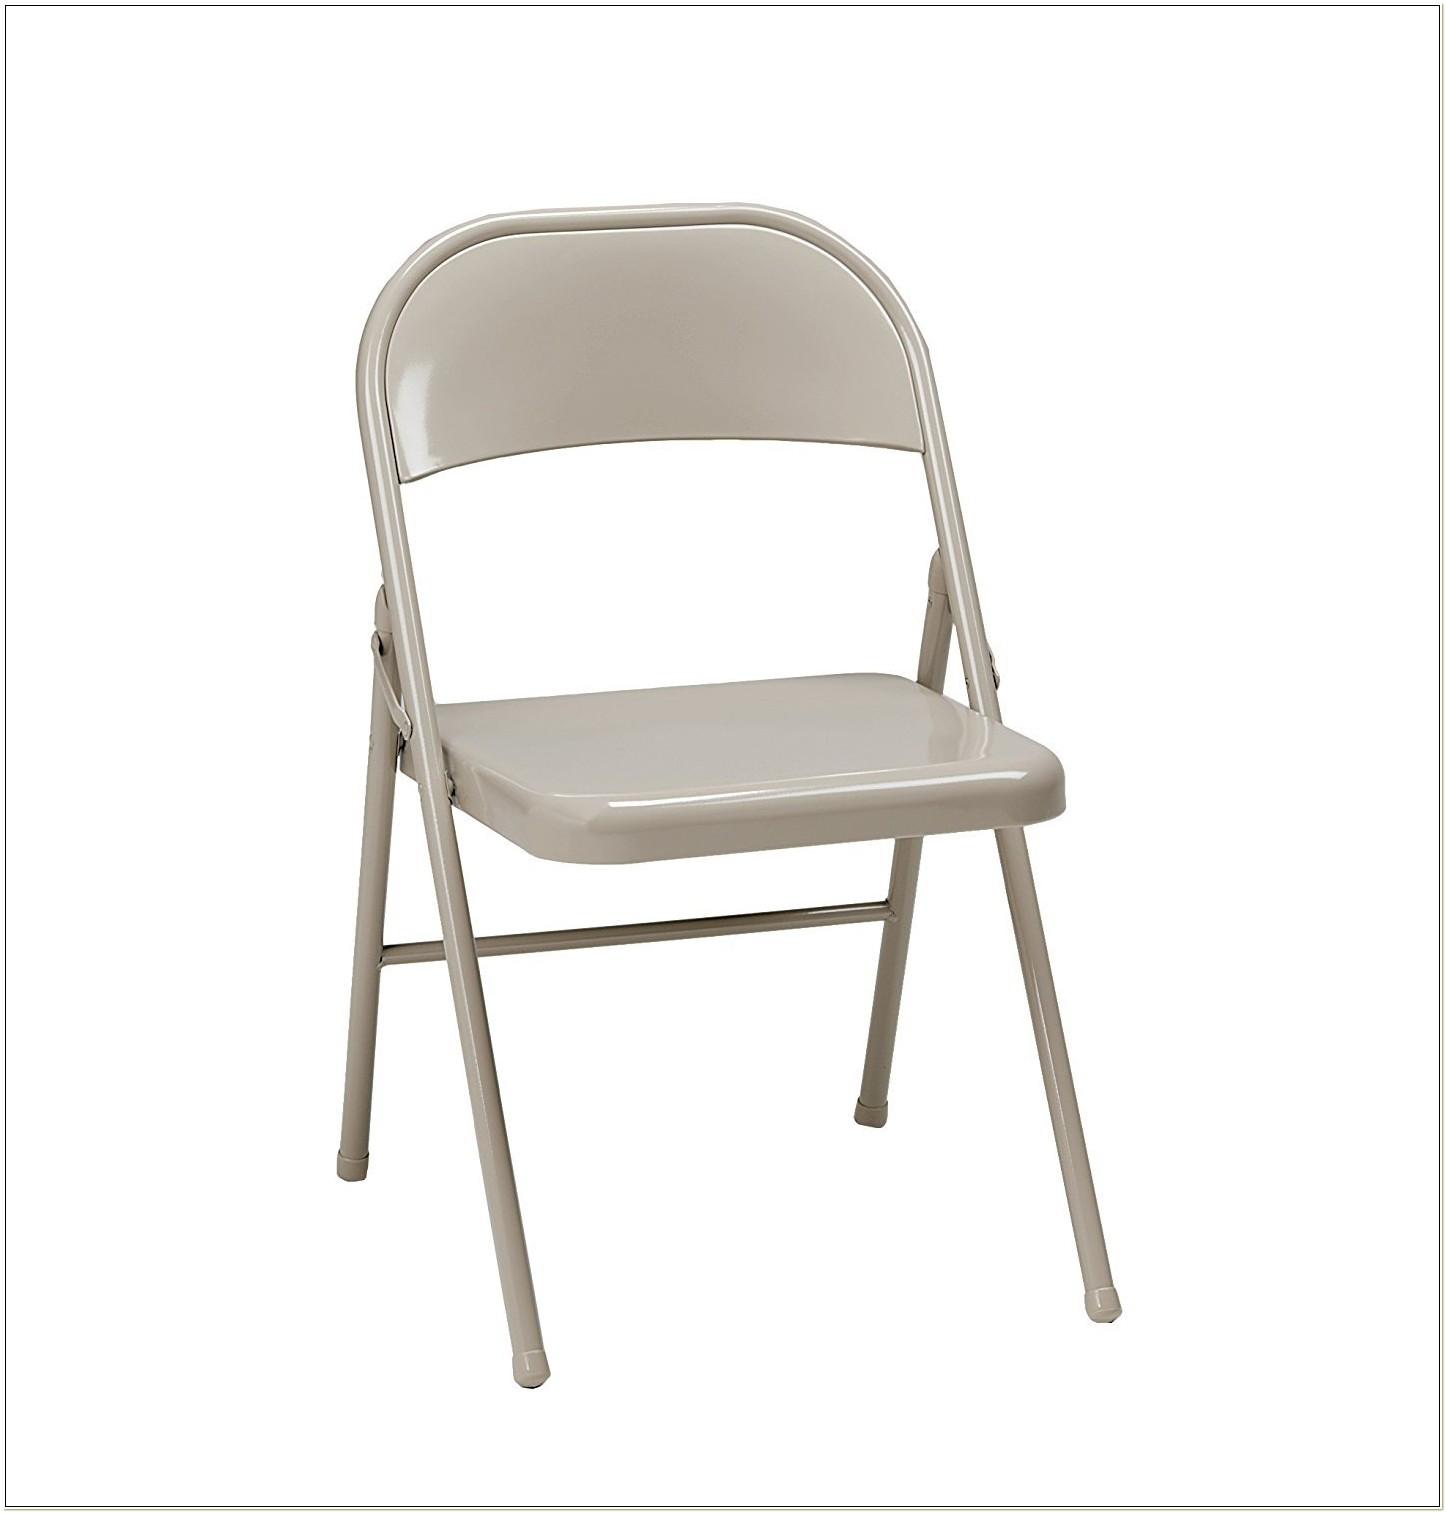 Sudden Comfort Metal Folding Chairs